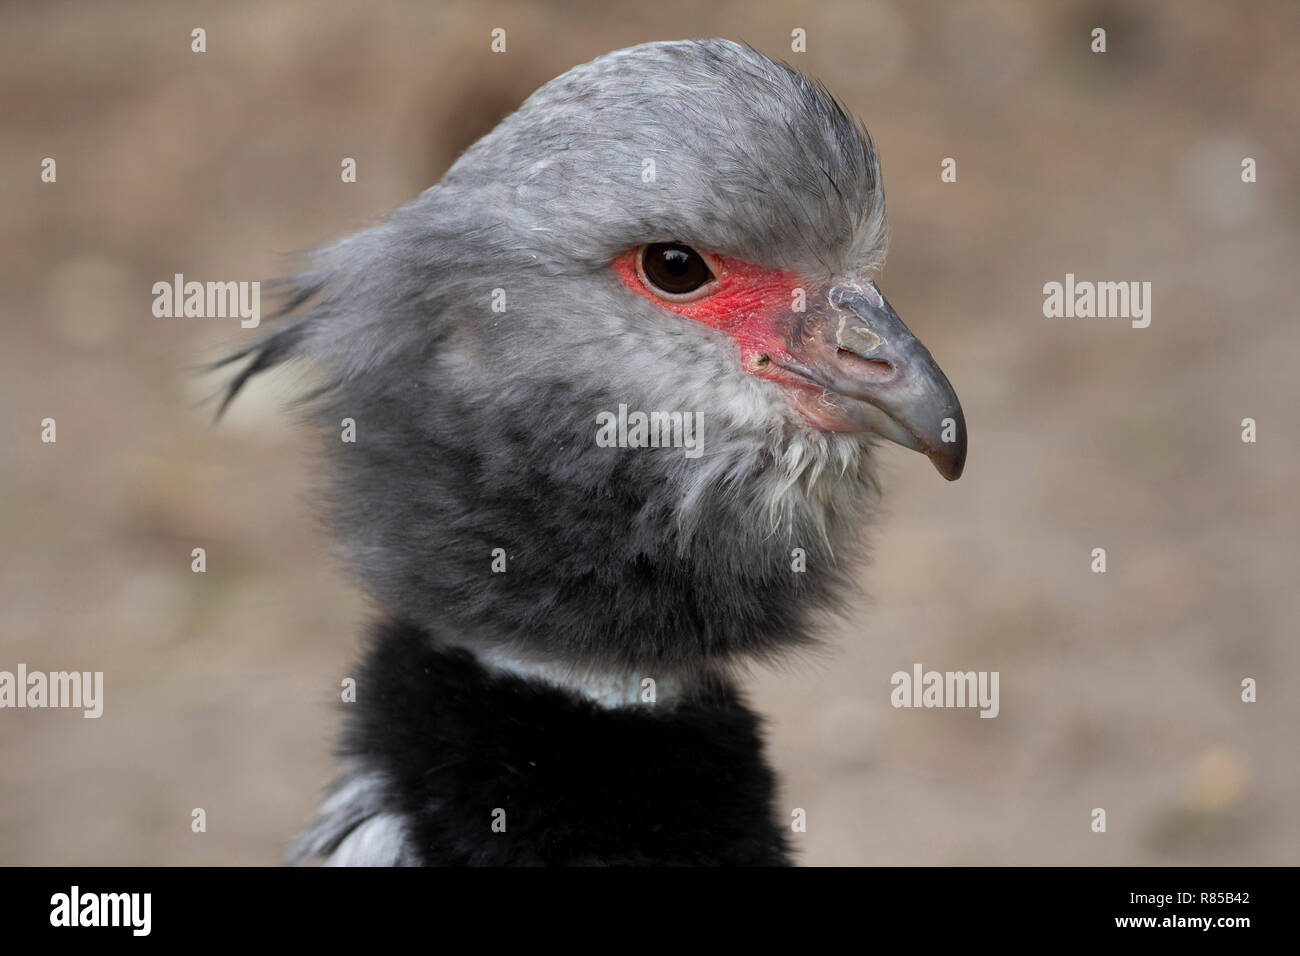 The southern Screamer, bird of South America, strange bird with black collar. - Stock Image